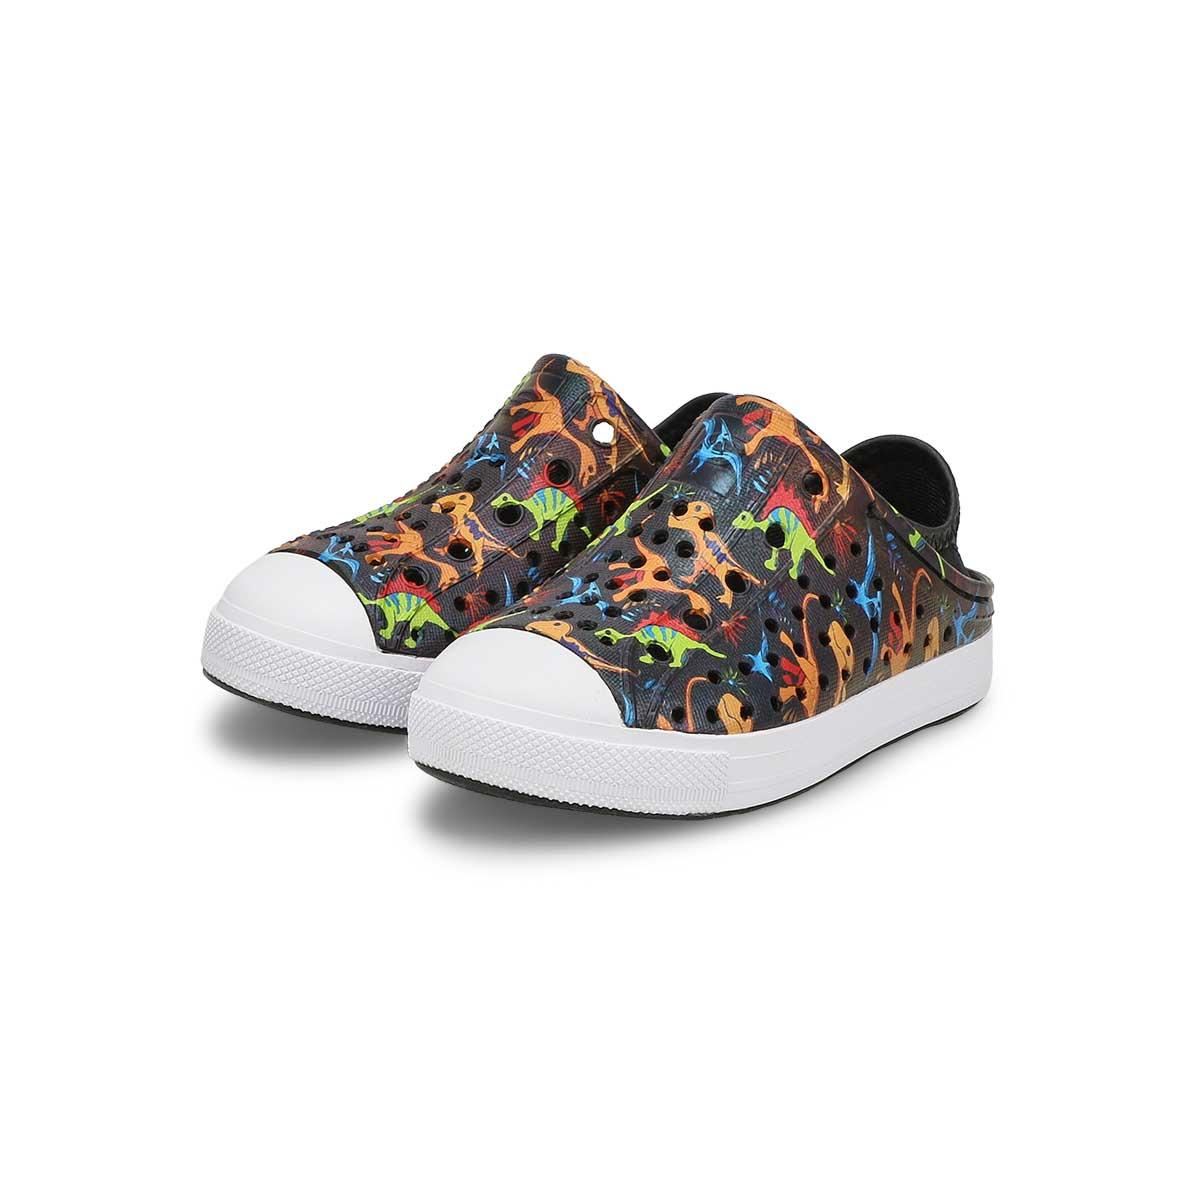 Infants' Guzman Steps Lil Dino Shoe - Black/Multi